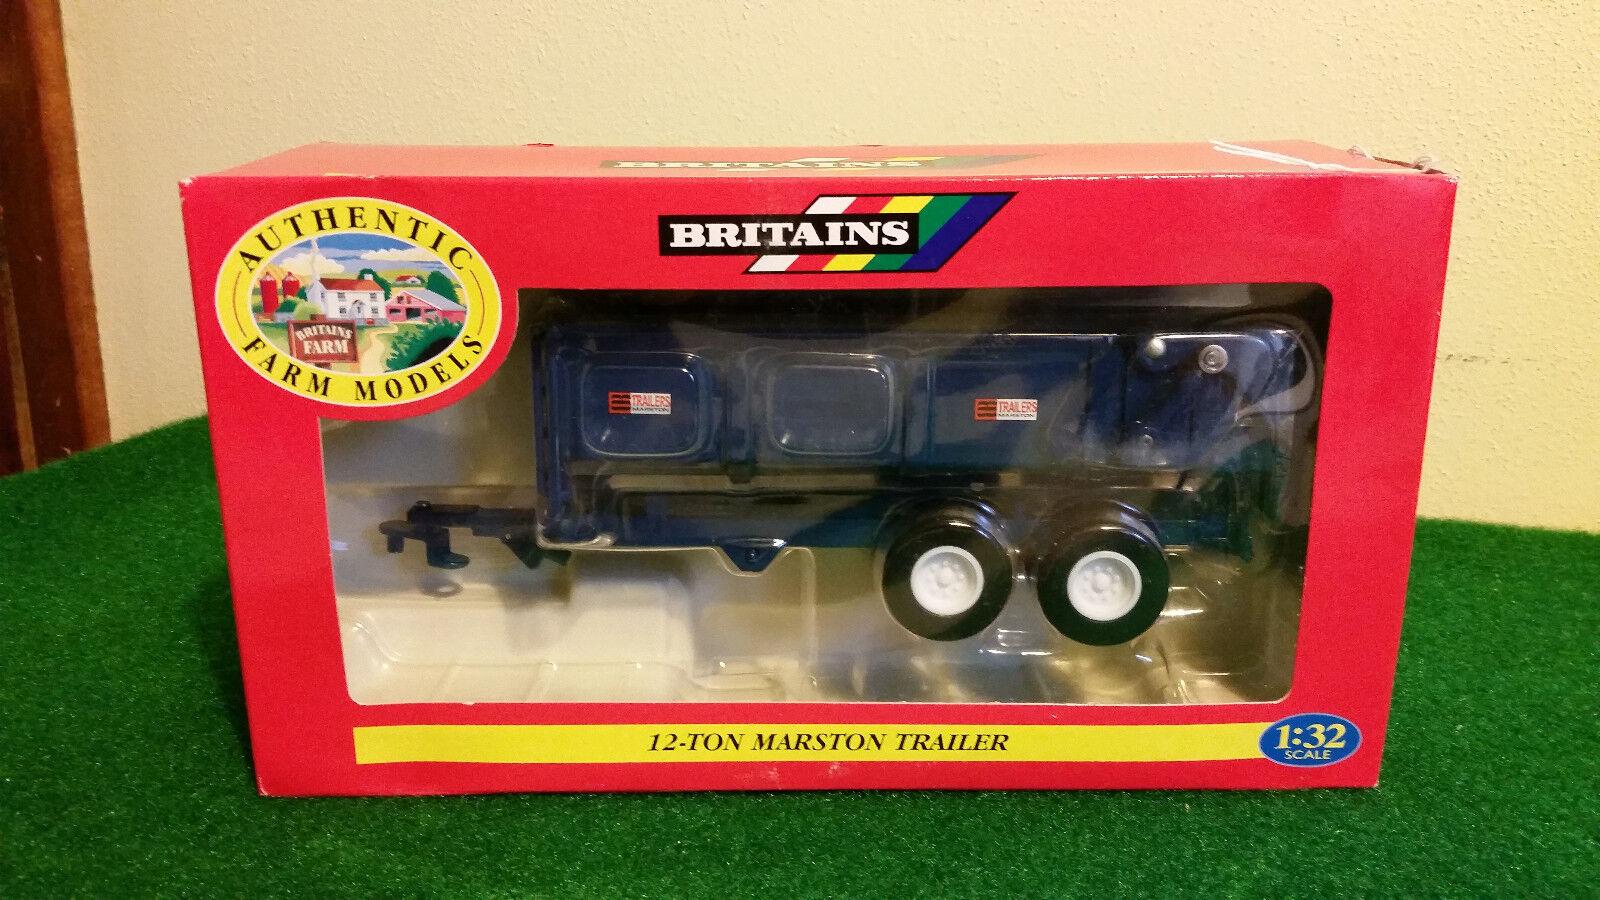 bluee 12-Ton 12-Ton 12-Ton Marston Trailer By Britains 1 32nd Scale f291c6